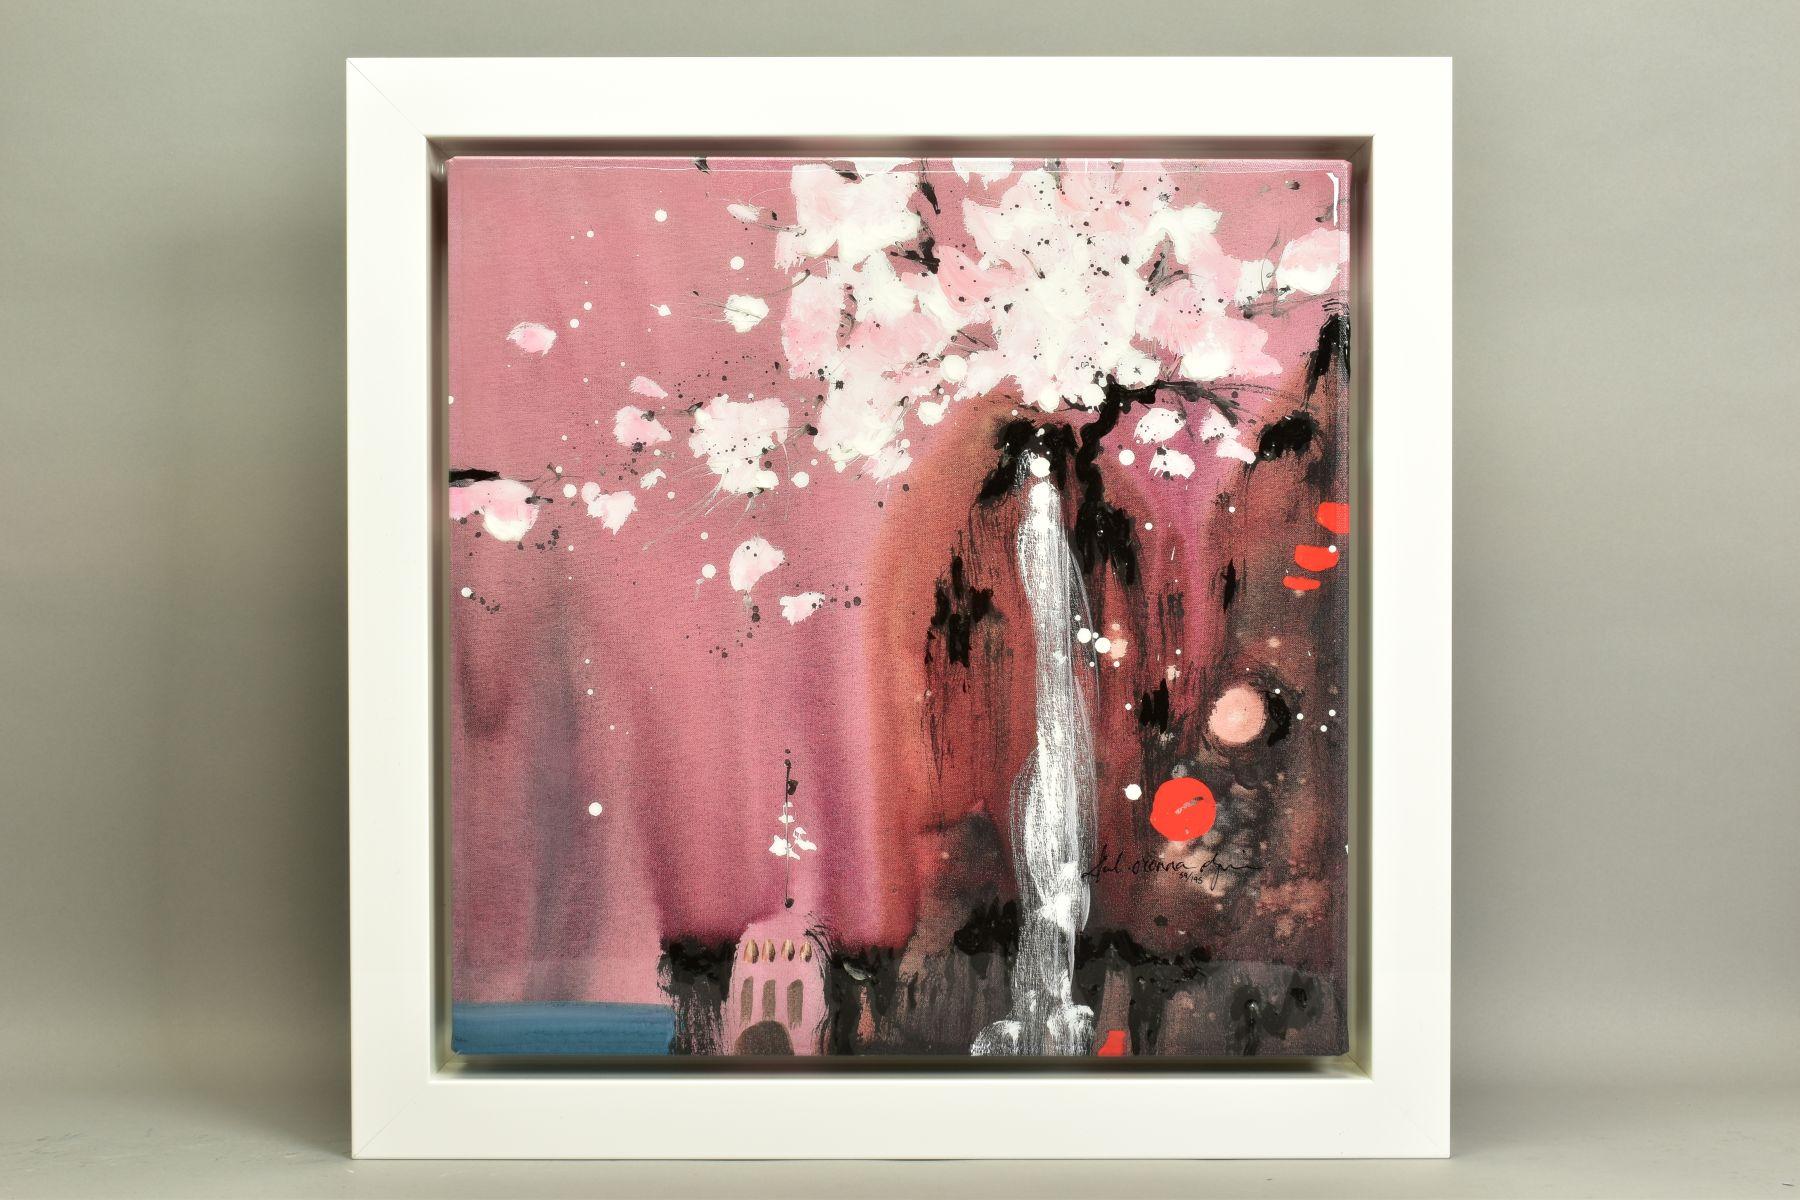 DANIELLE O'CONNOR AKIYAMA (CANADA 1957), 'Painted Dreams I', a Limited Edition print of a